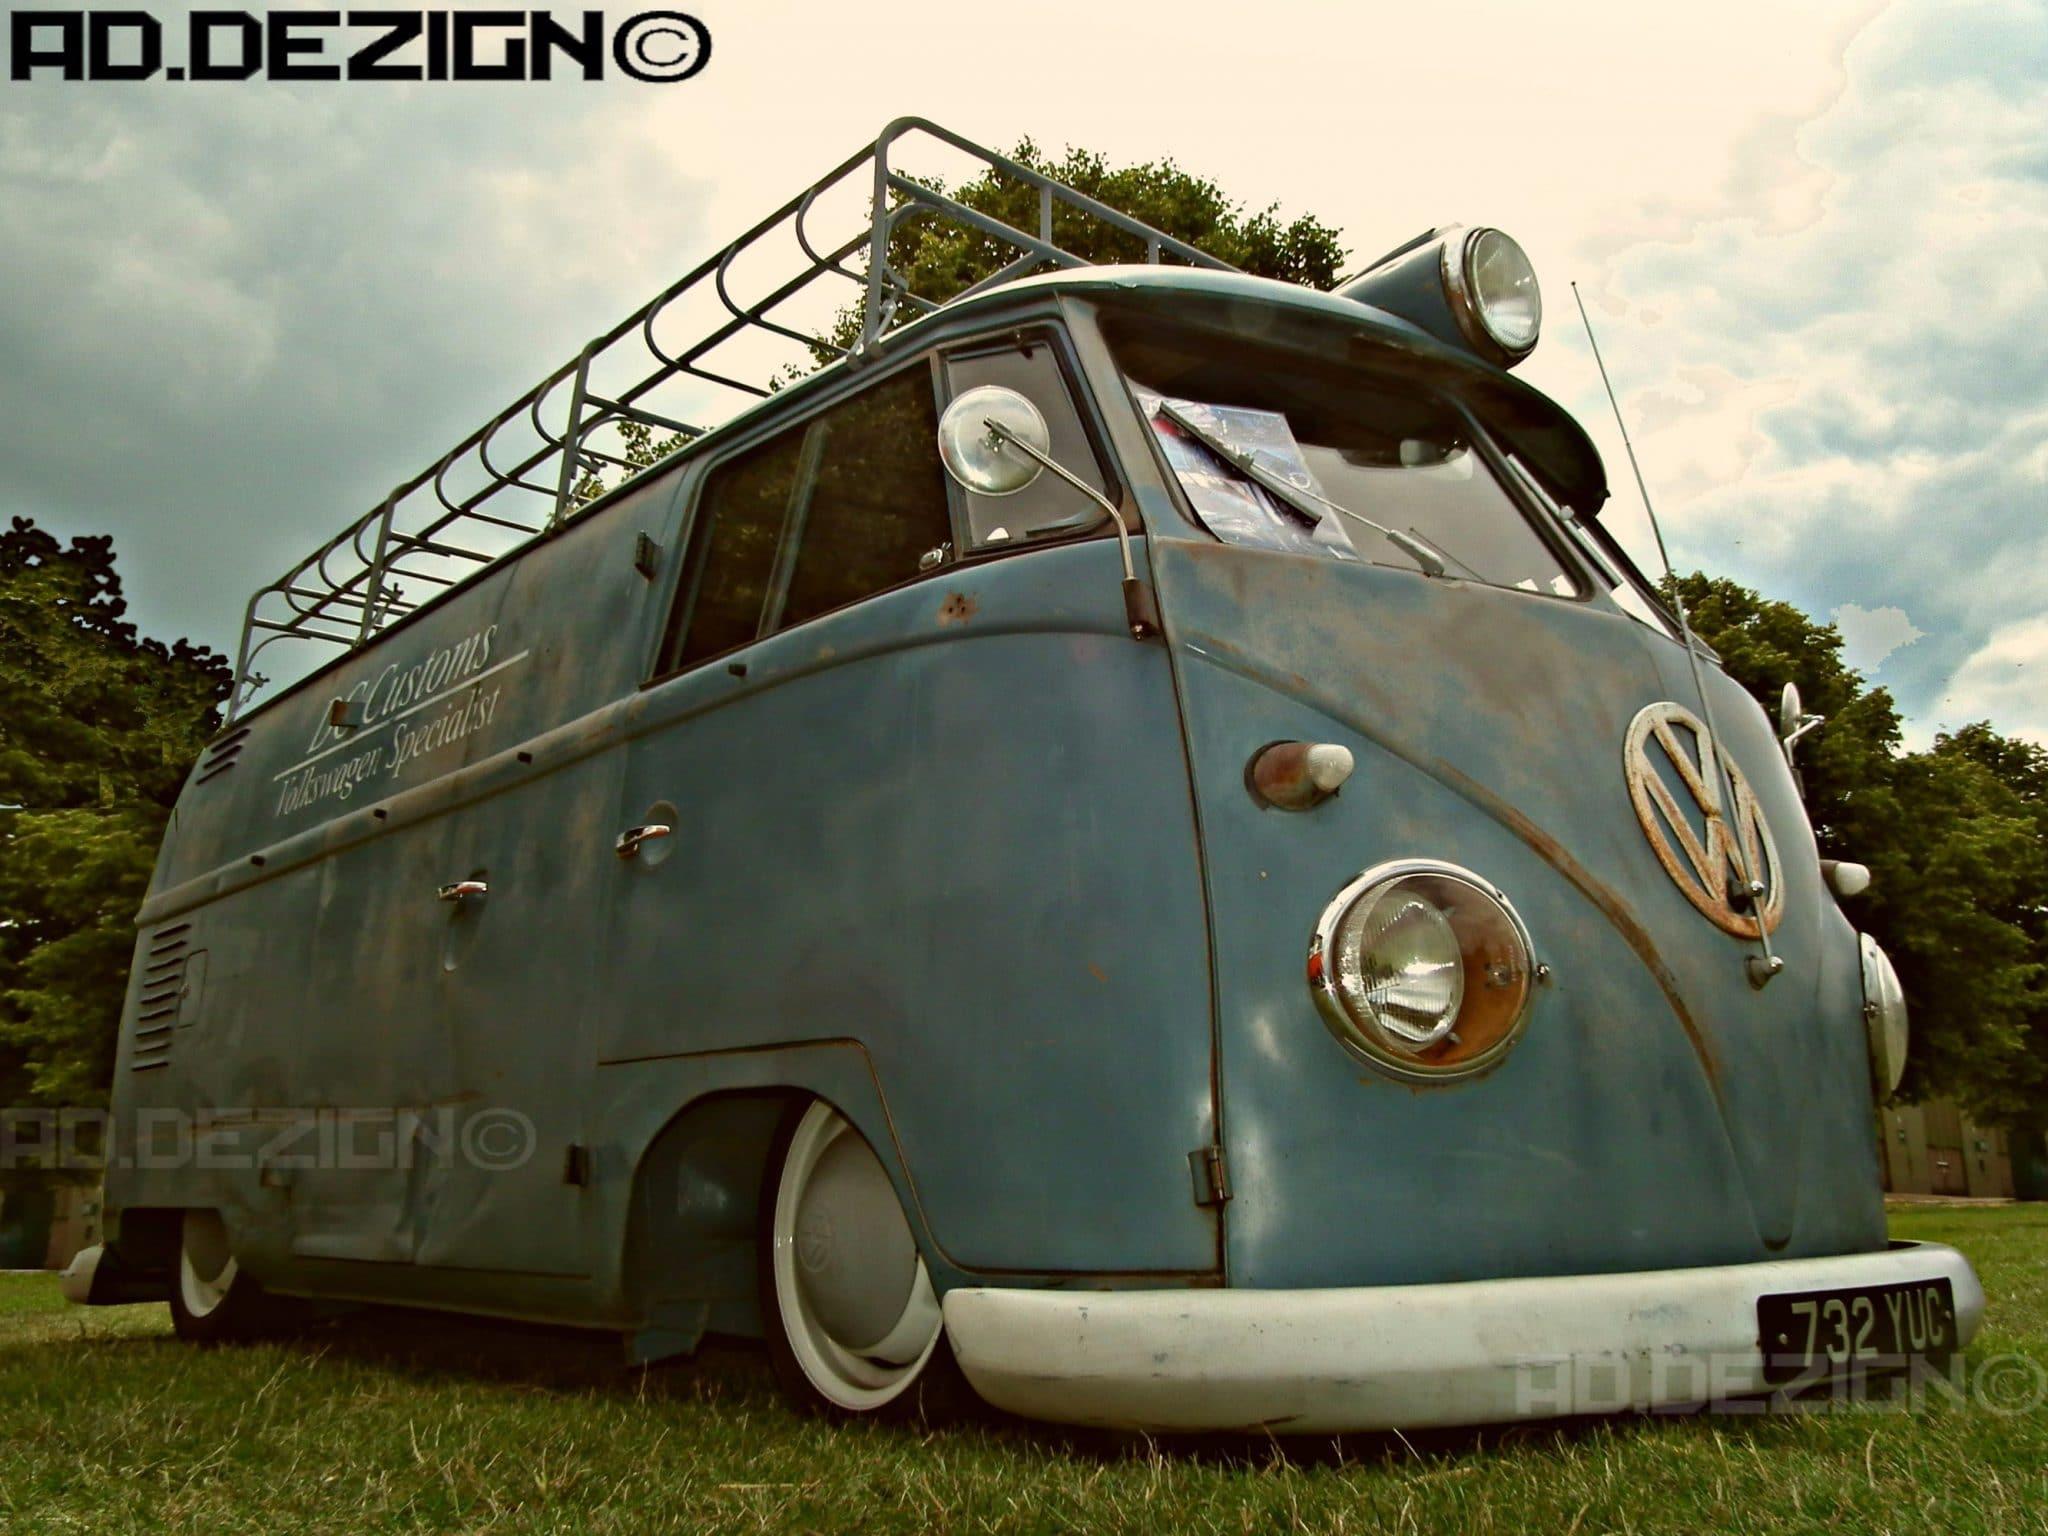 VW camper van ad.dezign image